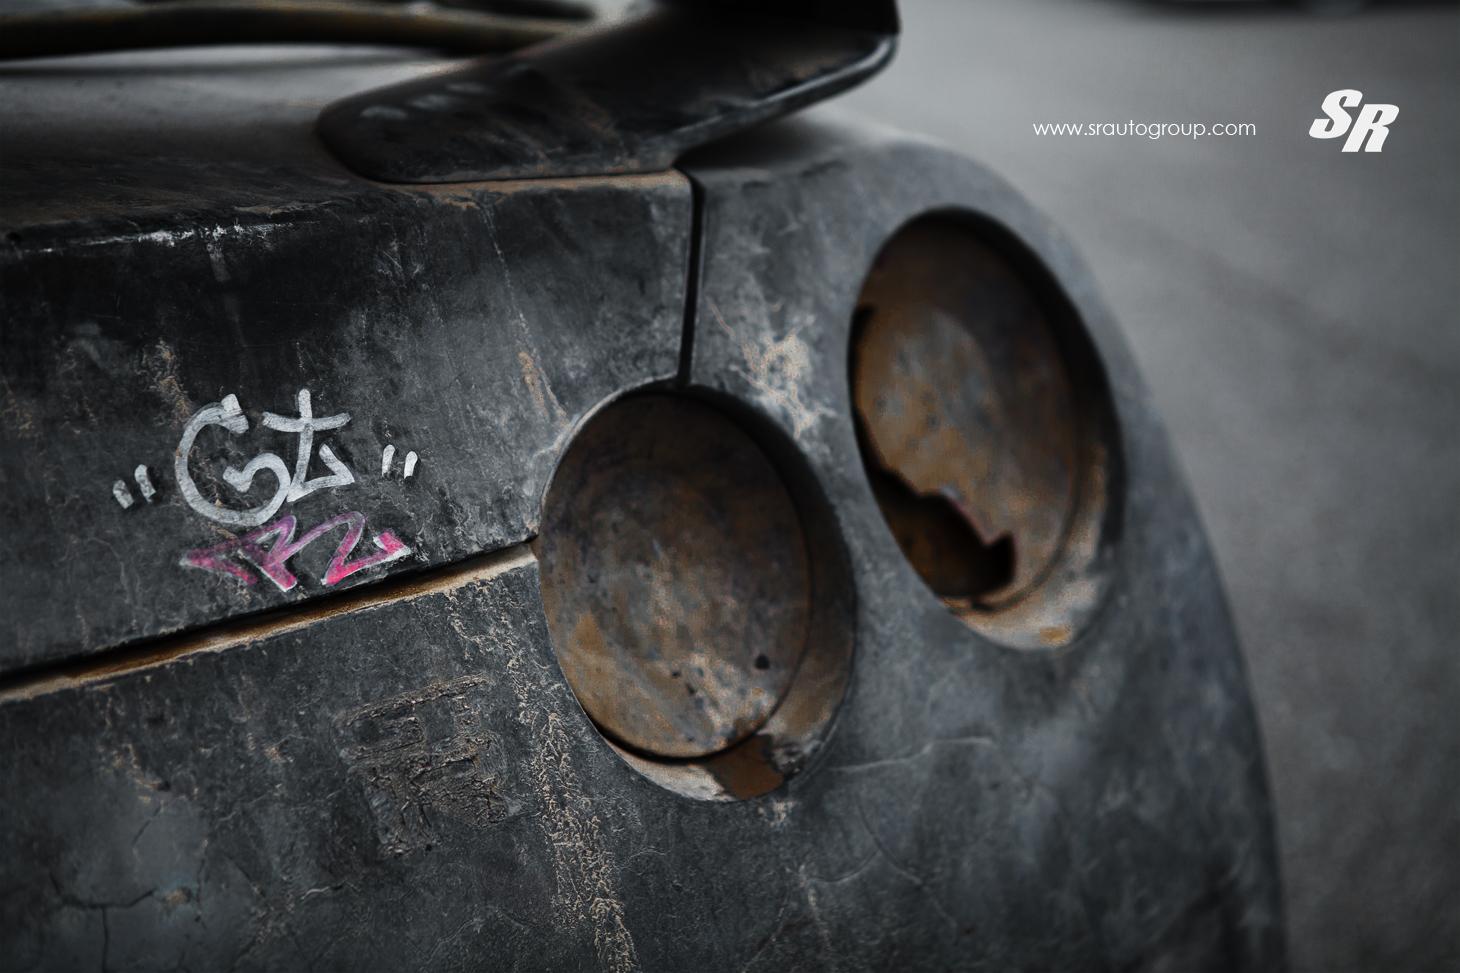 2154 Nissan Gt R From Elysium Gets Custom Pur Wheels